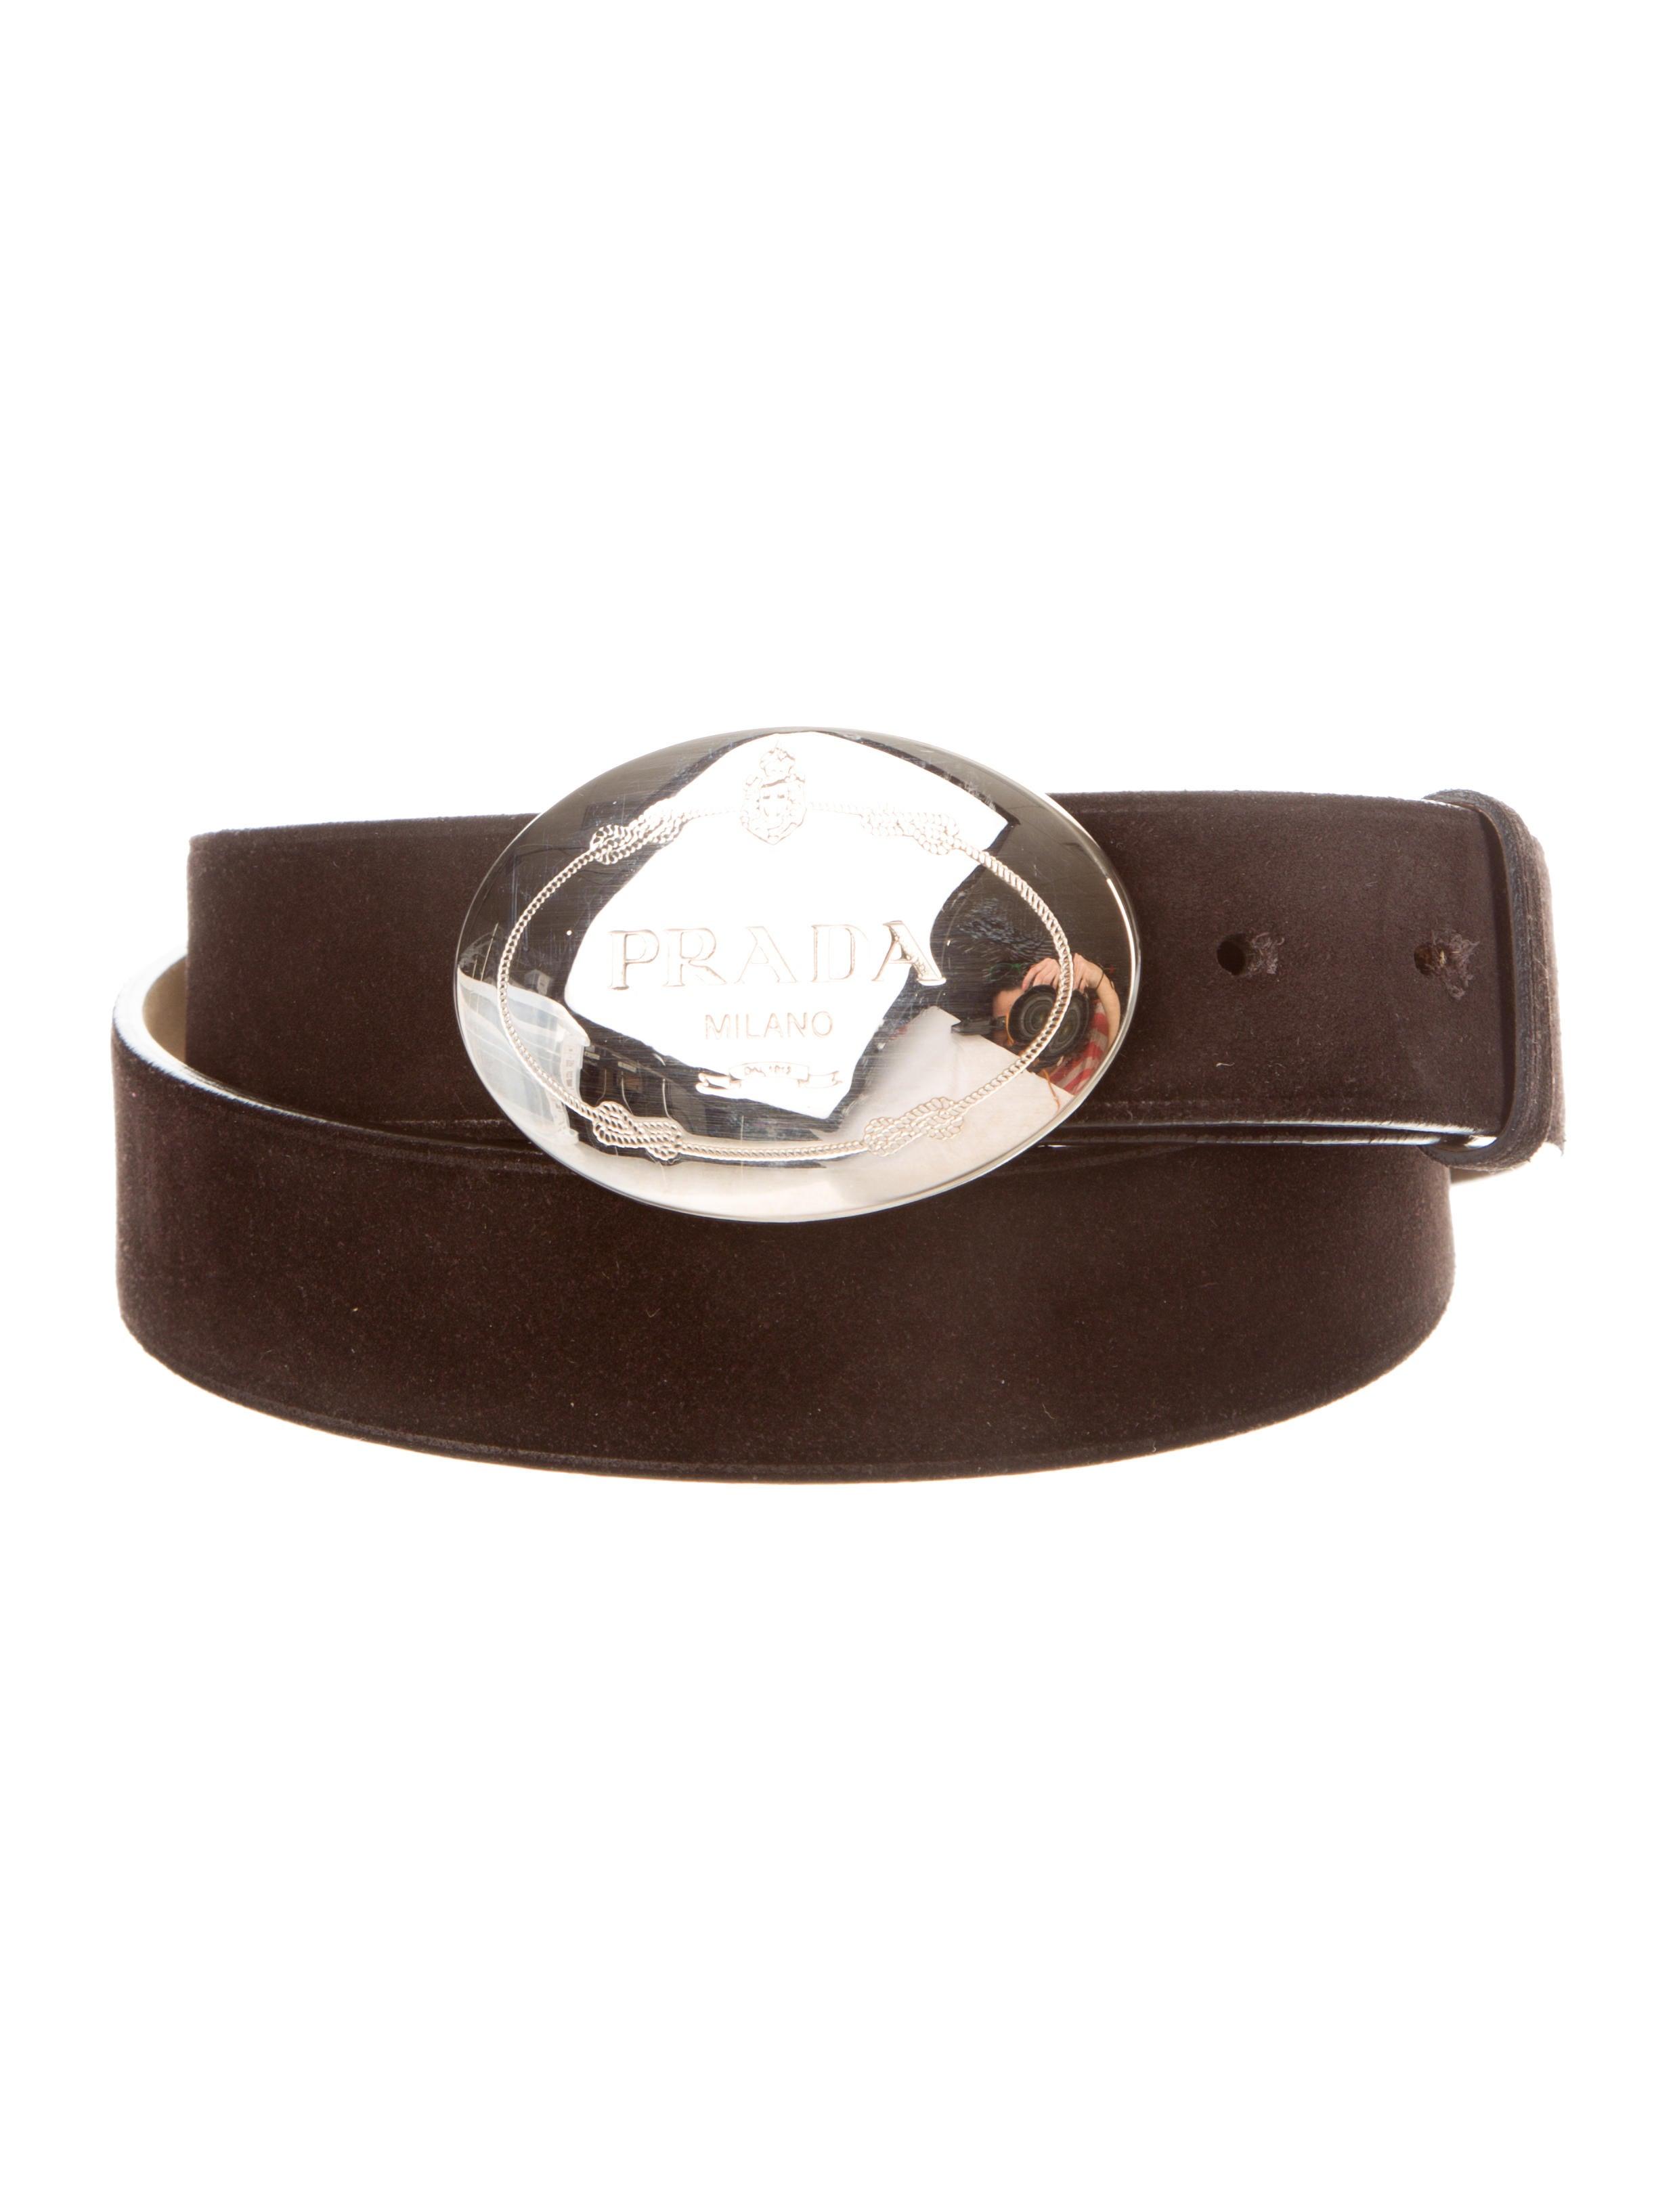 Prada Suede Logo Belt - Mens Accessories - PRA83780 | The RealReal